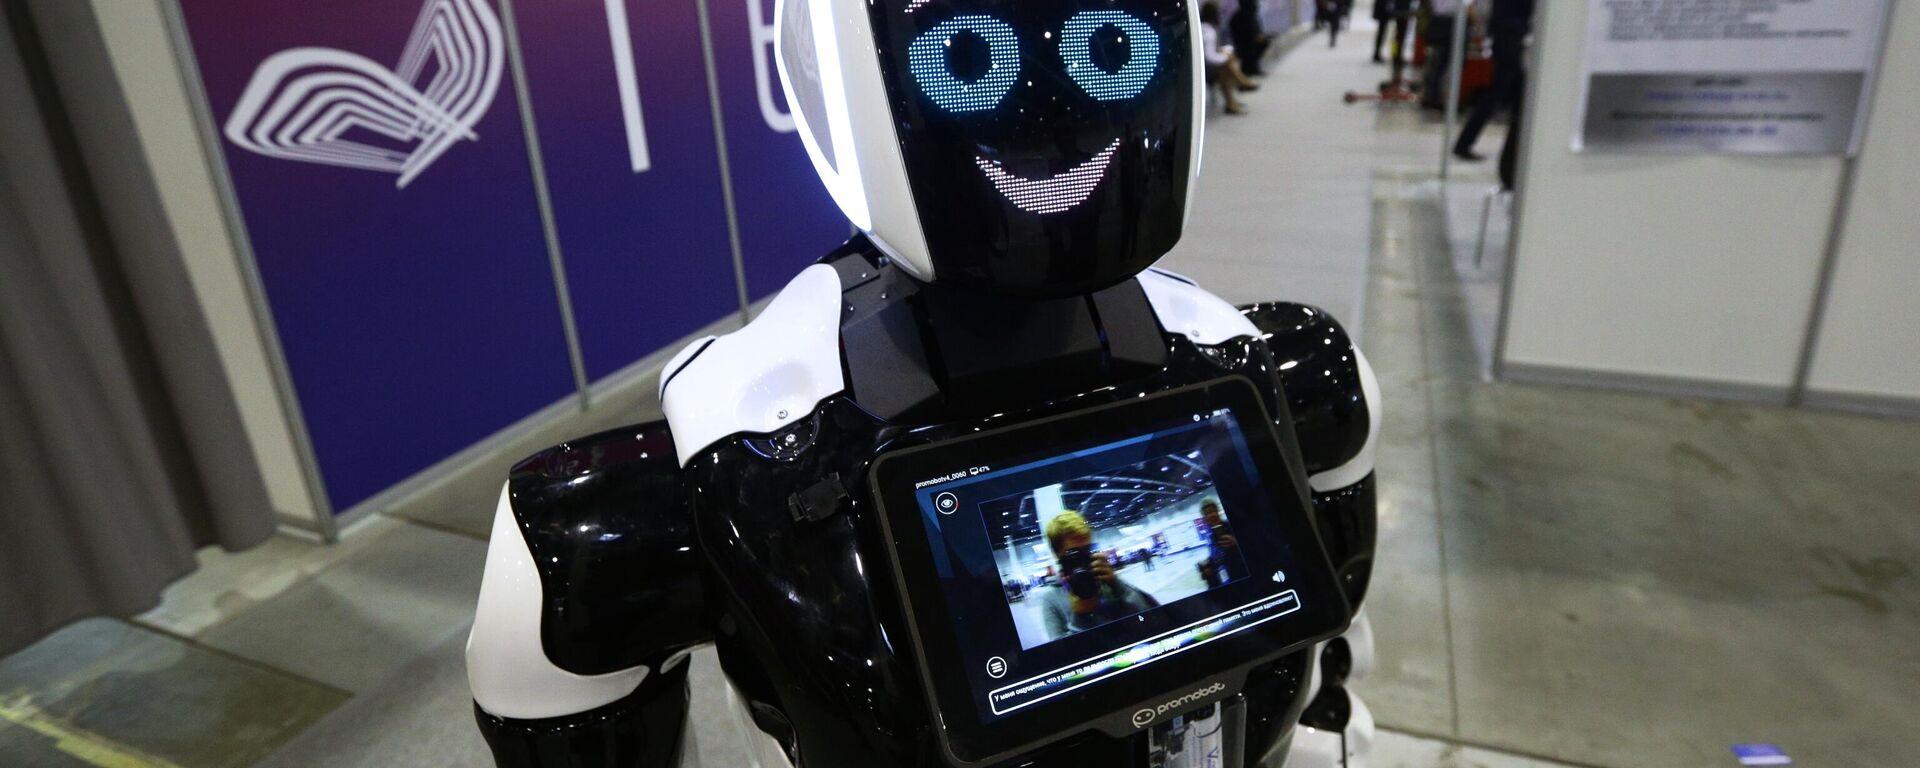 Promobot, robot ruso - Sputnik Mundo, 1920, 08.07.2021